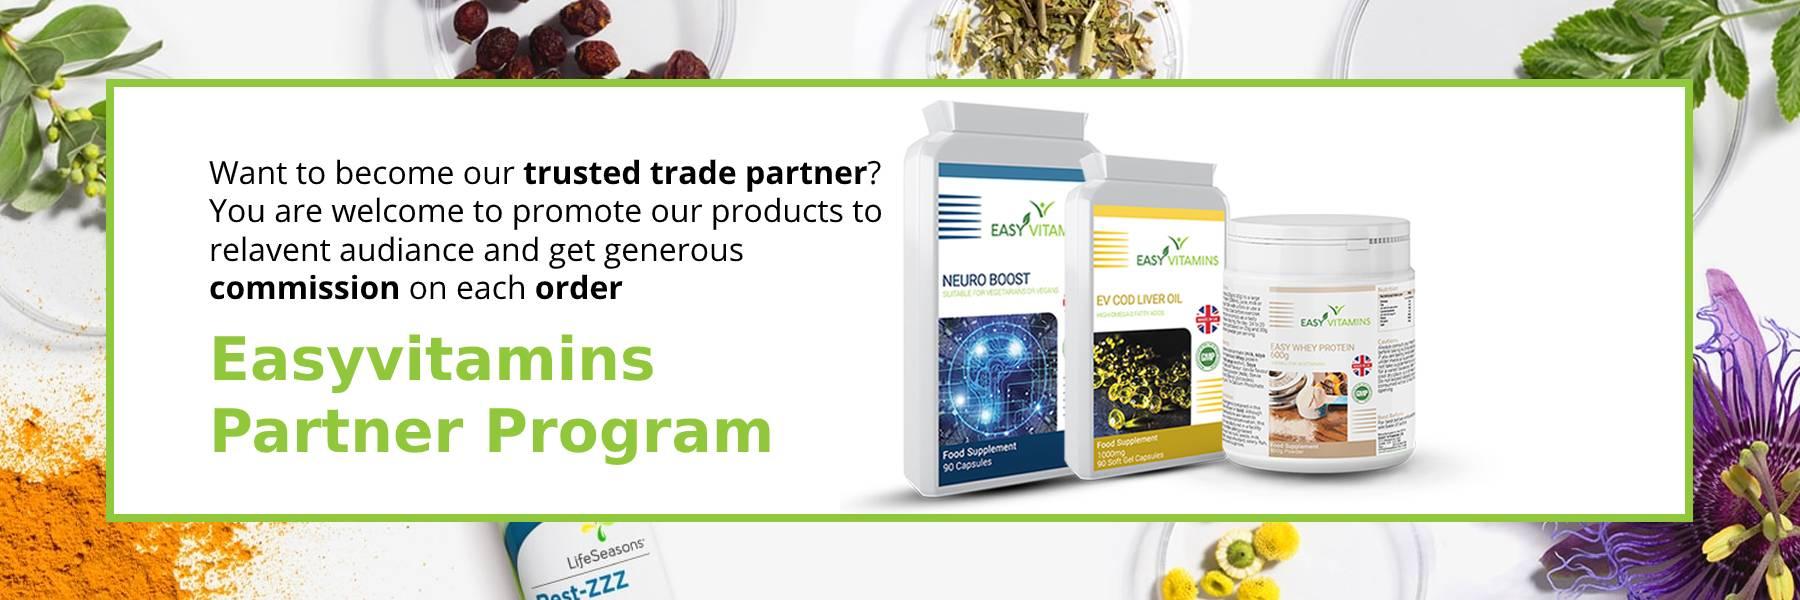 Easy Vitamins Partner Program